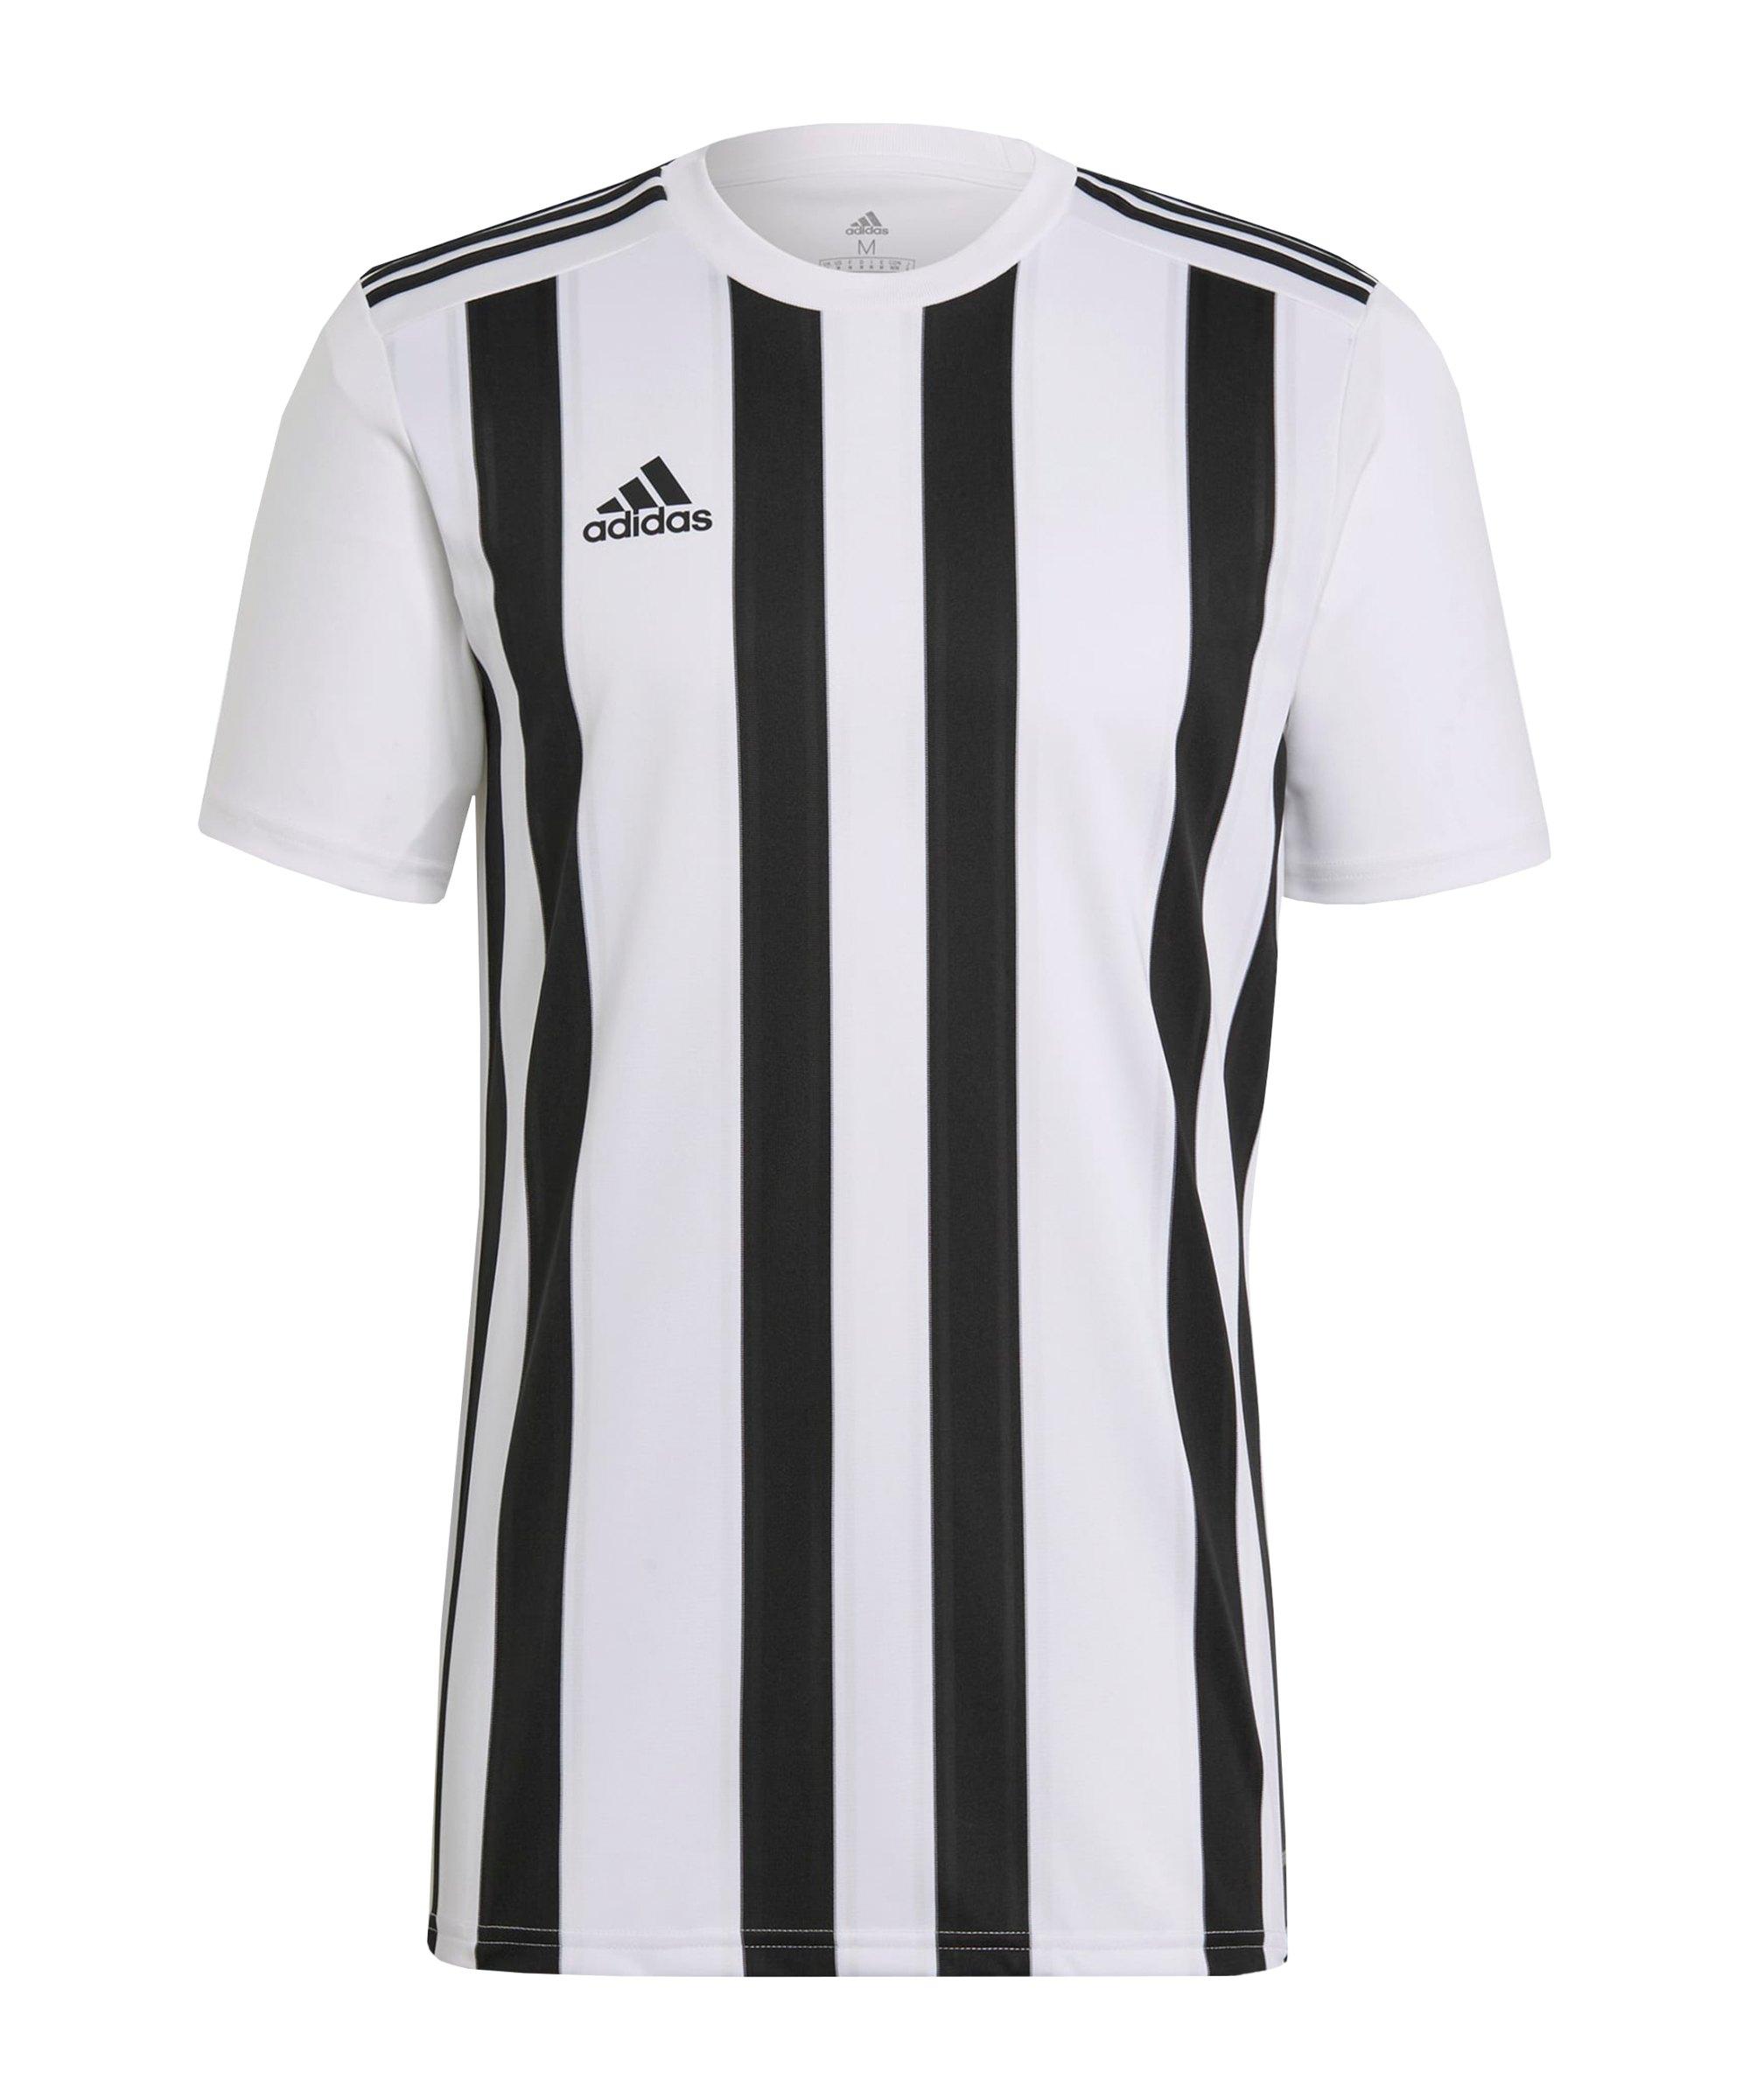 adidas Striped 21 Trikot kurzarm Weiss Schwarz - weiss